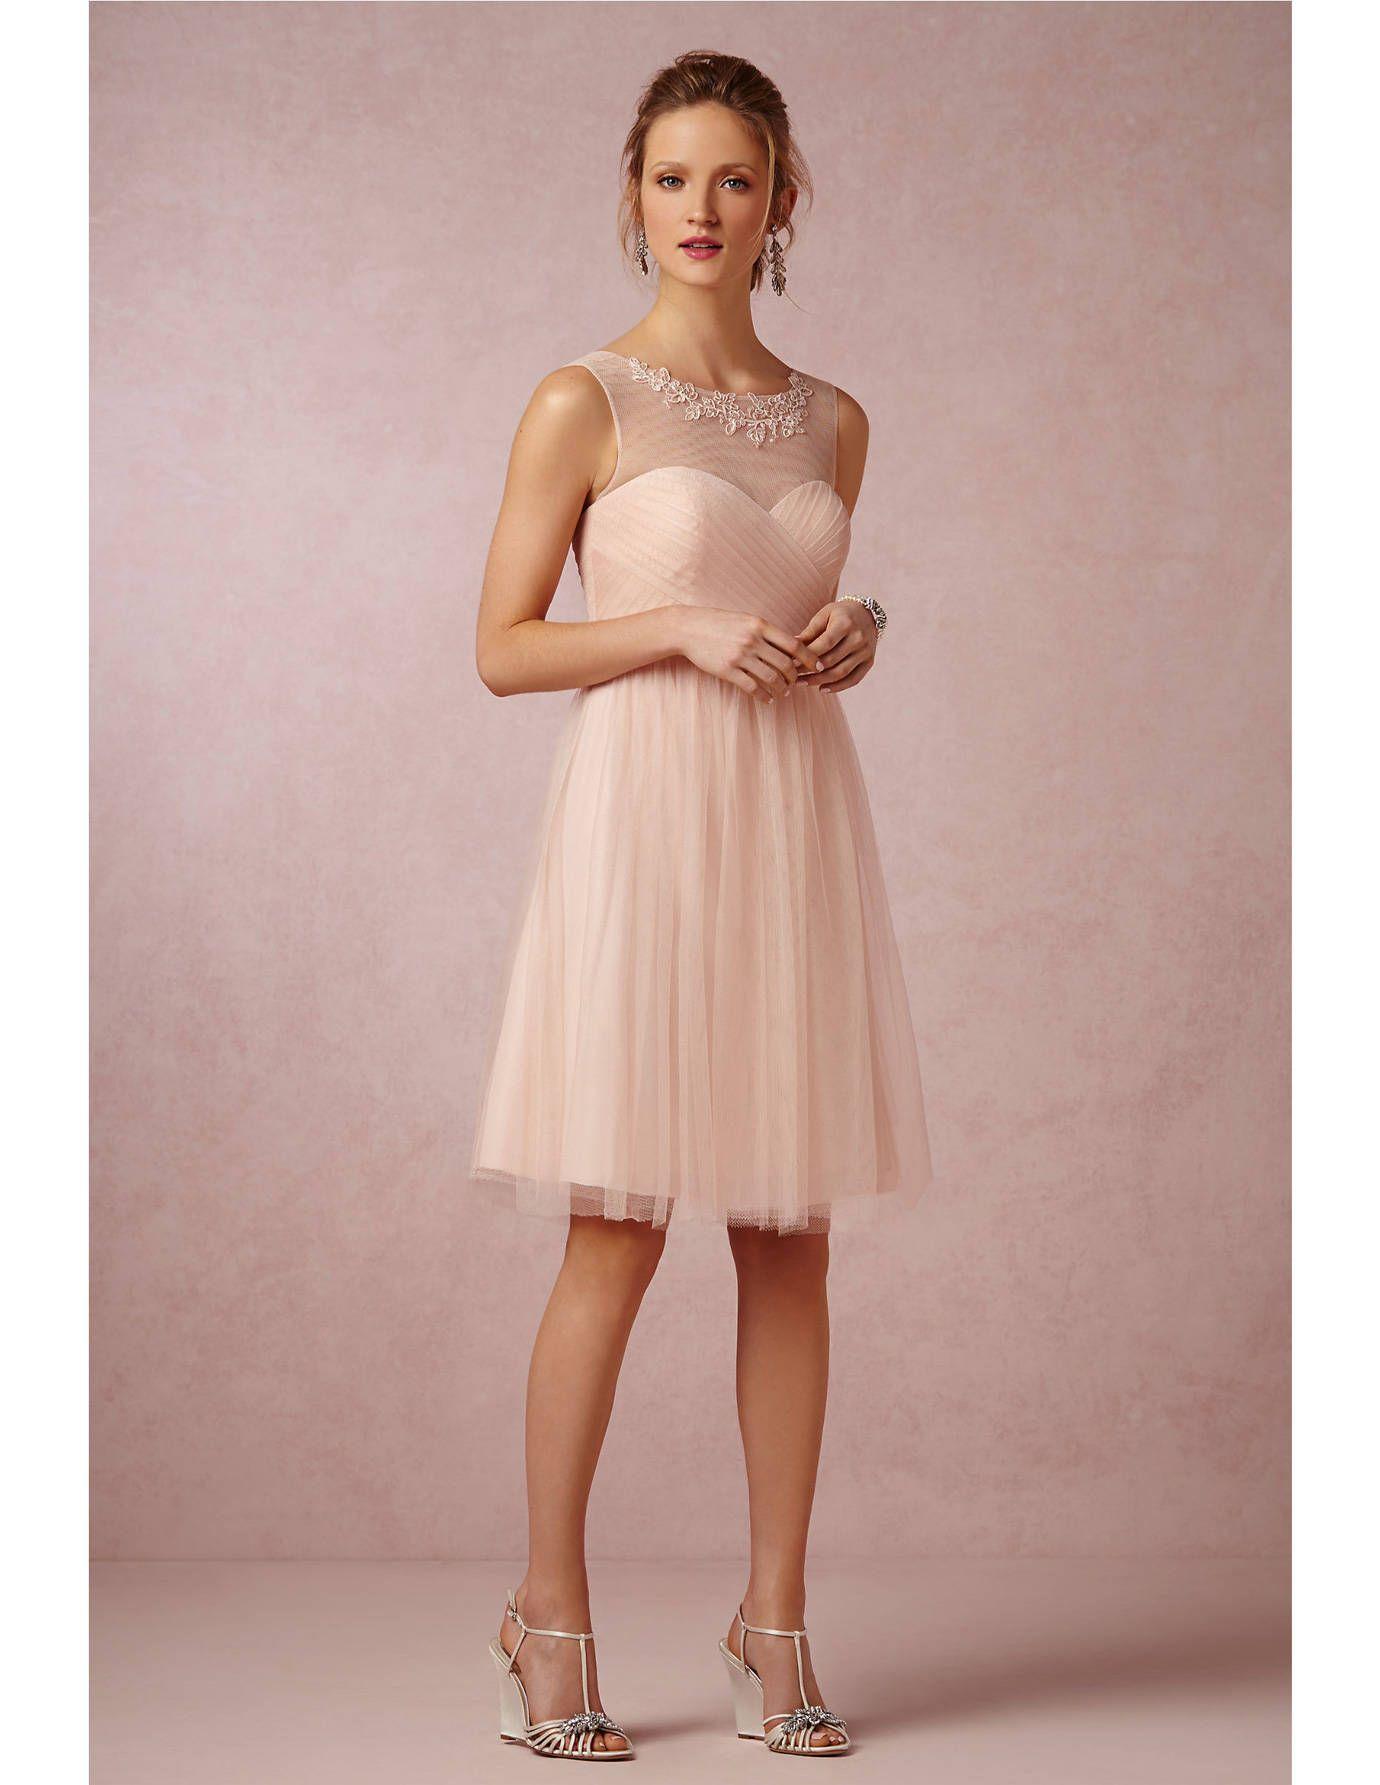 Best Neutral Colored Bridesmaid Dresses - Best Pale Pink Bridesmaid ...